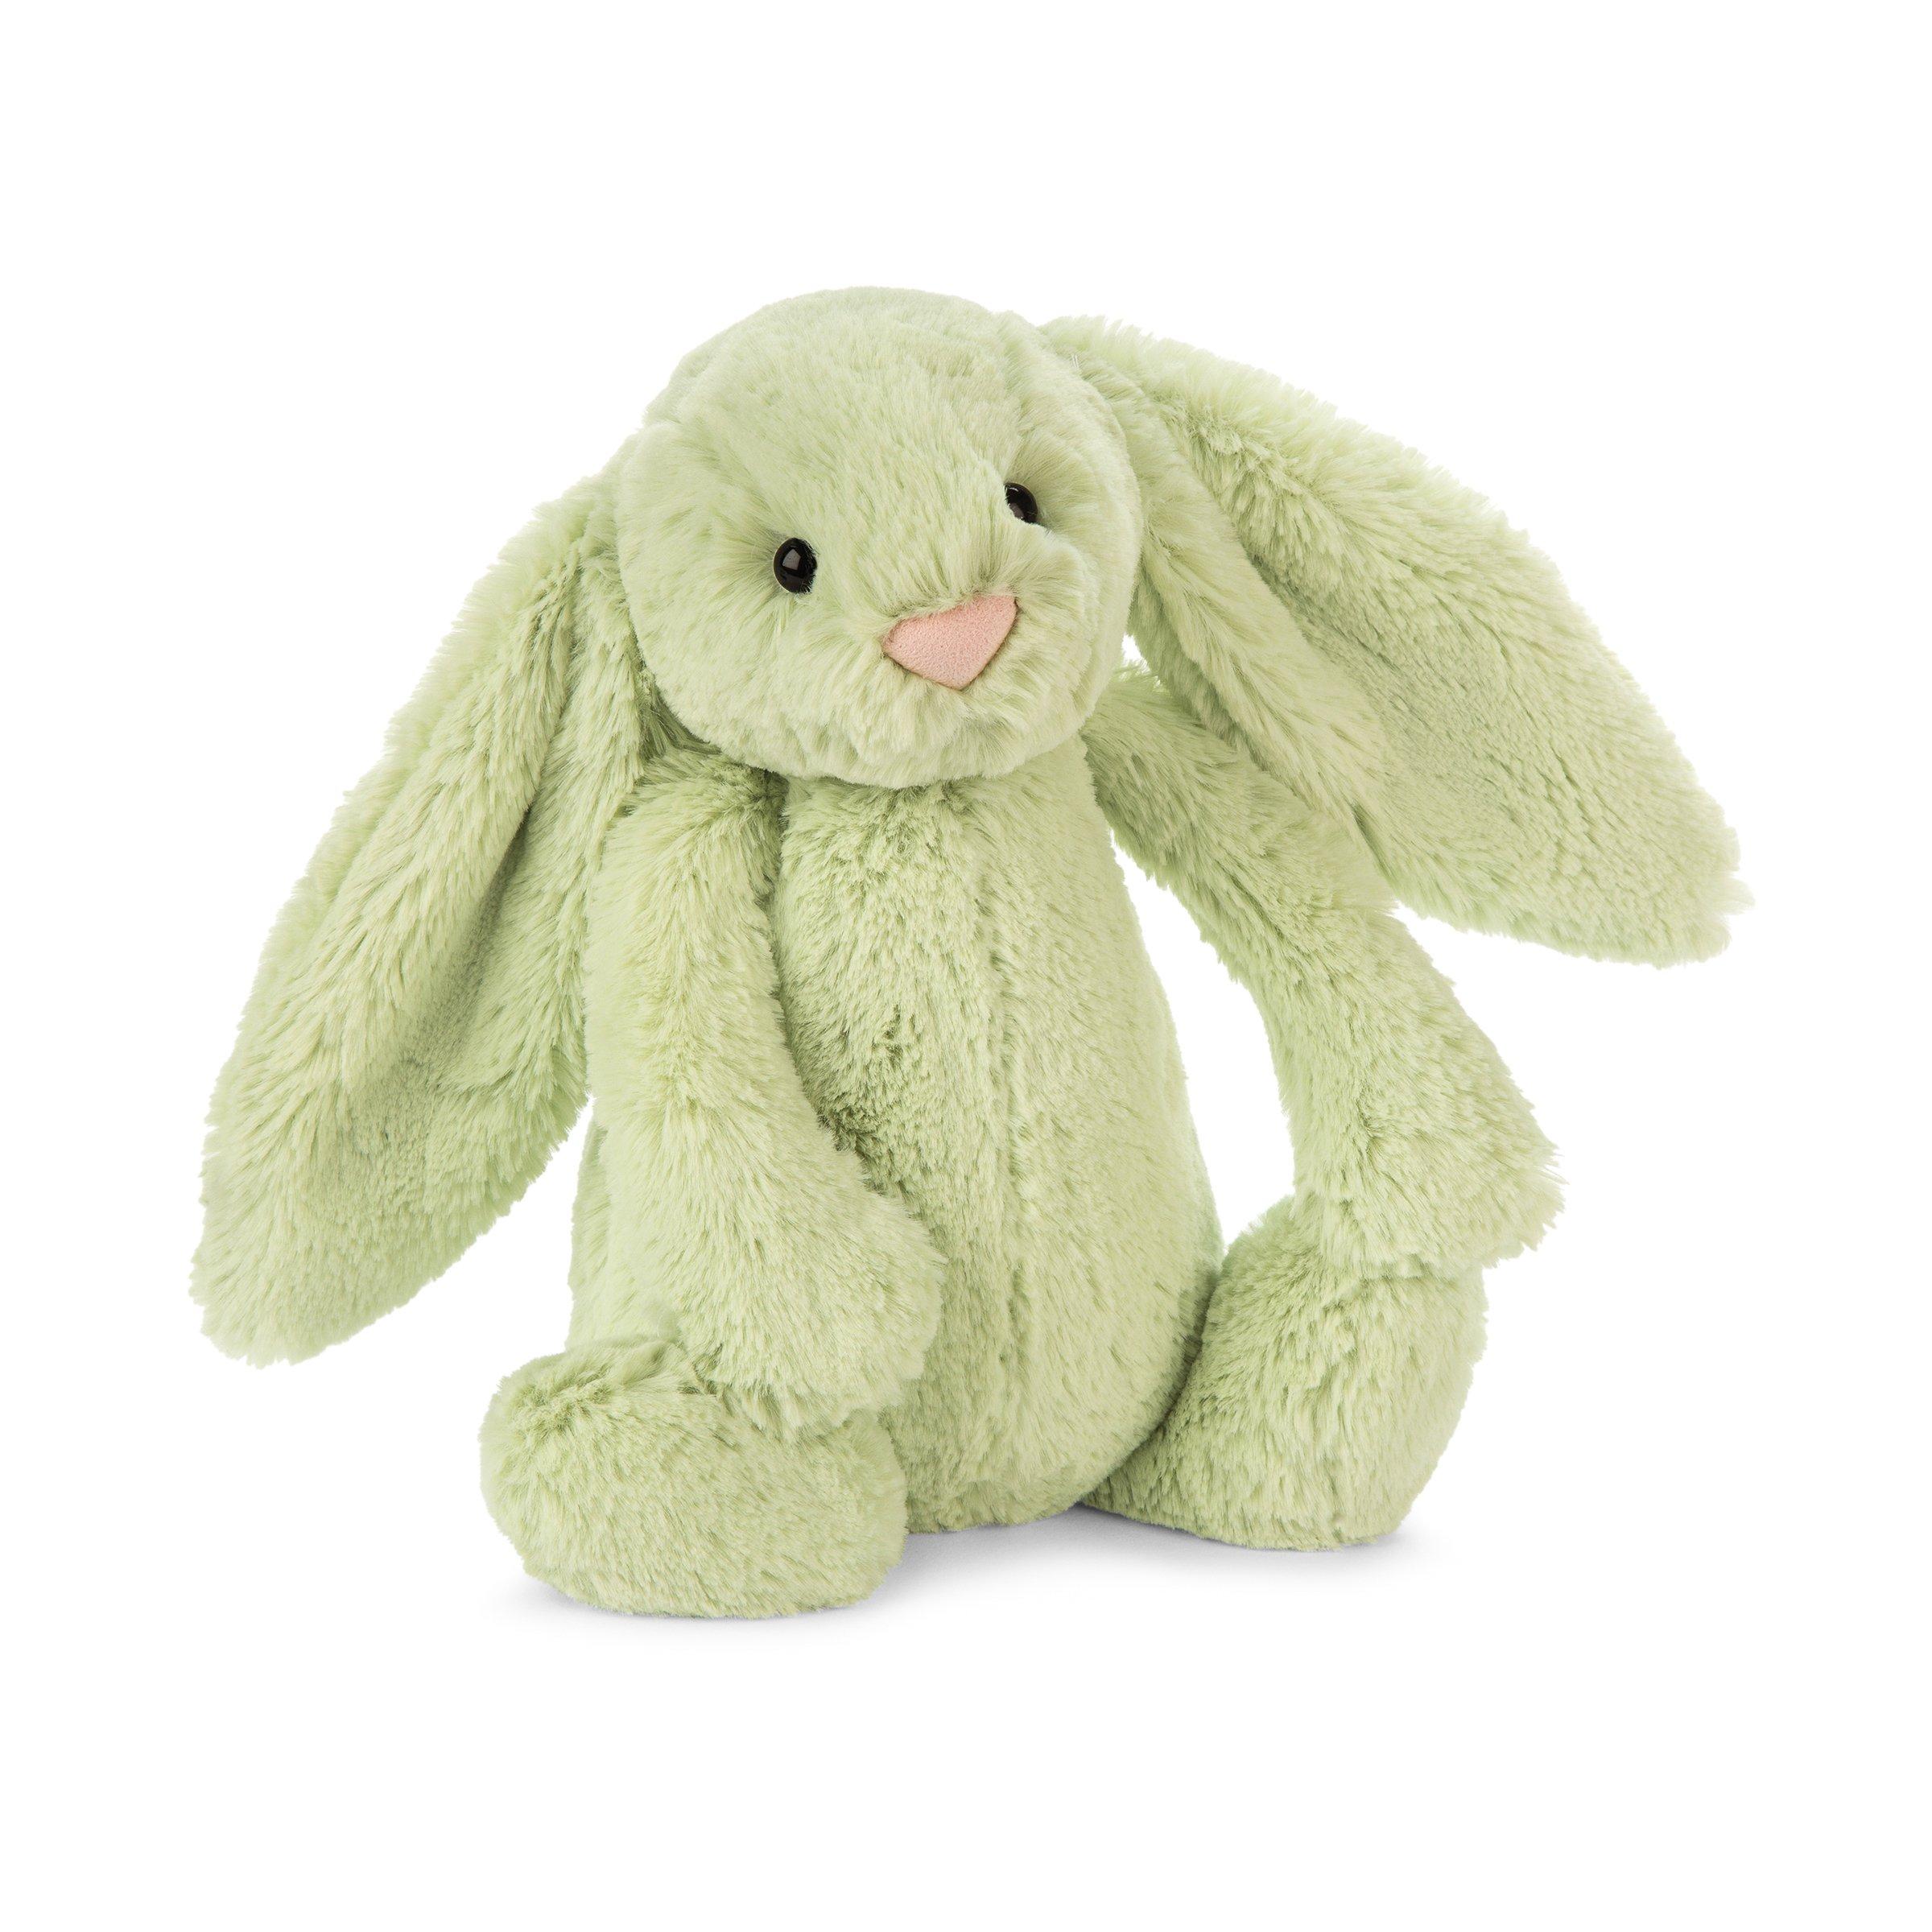 Medium 12 inches Jellycat Bashful Donkey Stuffed Animal